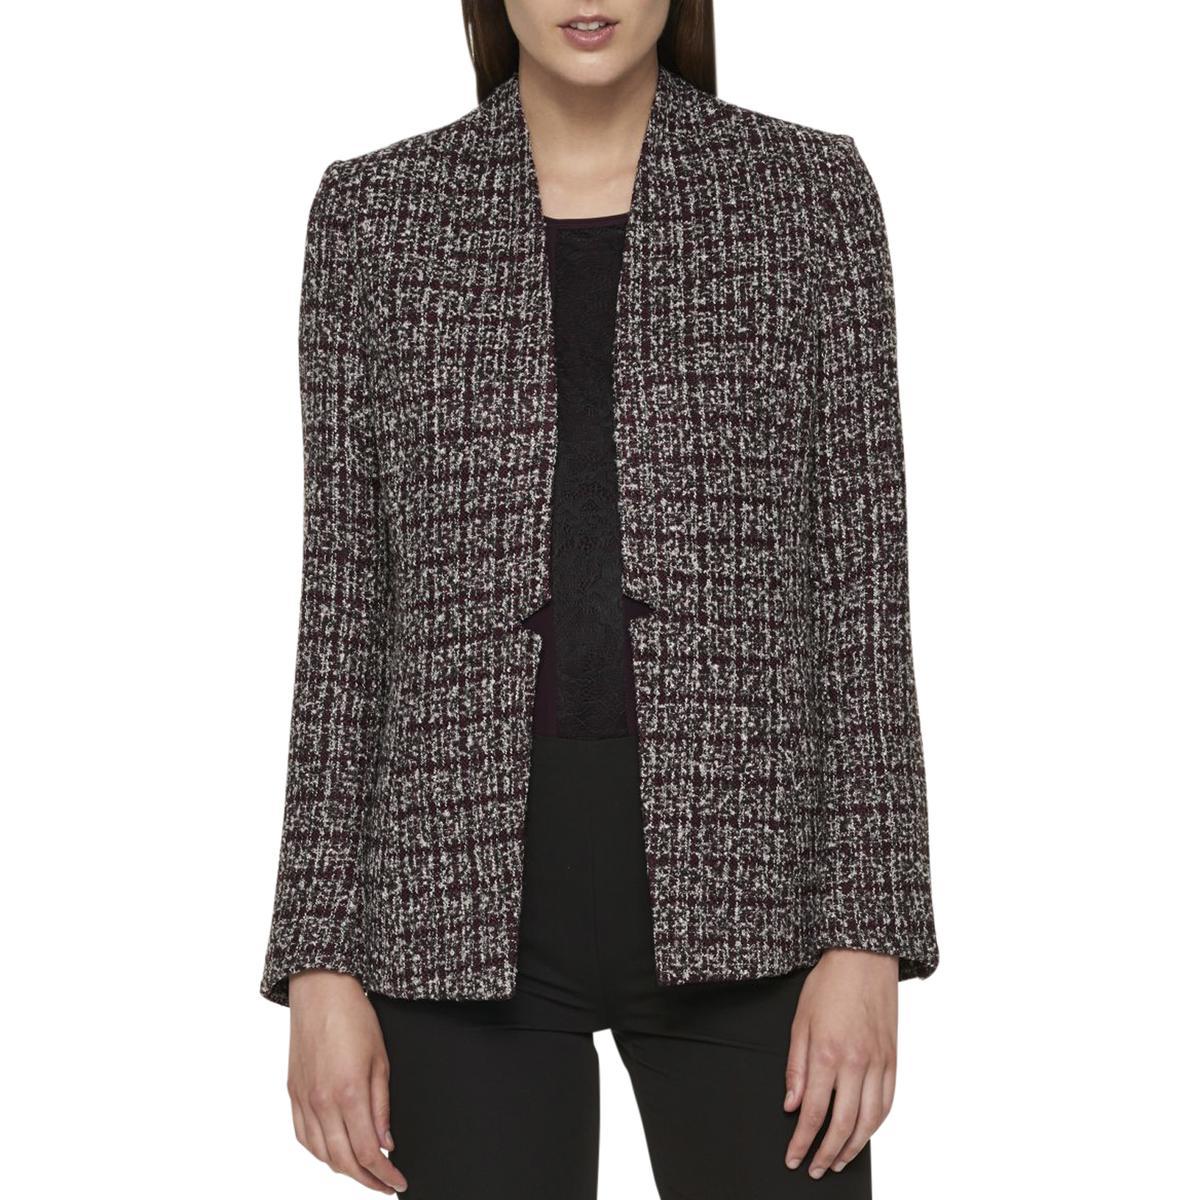 b14f7f0d Tommy Hilfiger Womens Tweed Office Open-Front Blazer Jacket BHFO 5080  Anzüge & Anzugteile